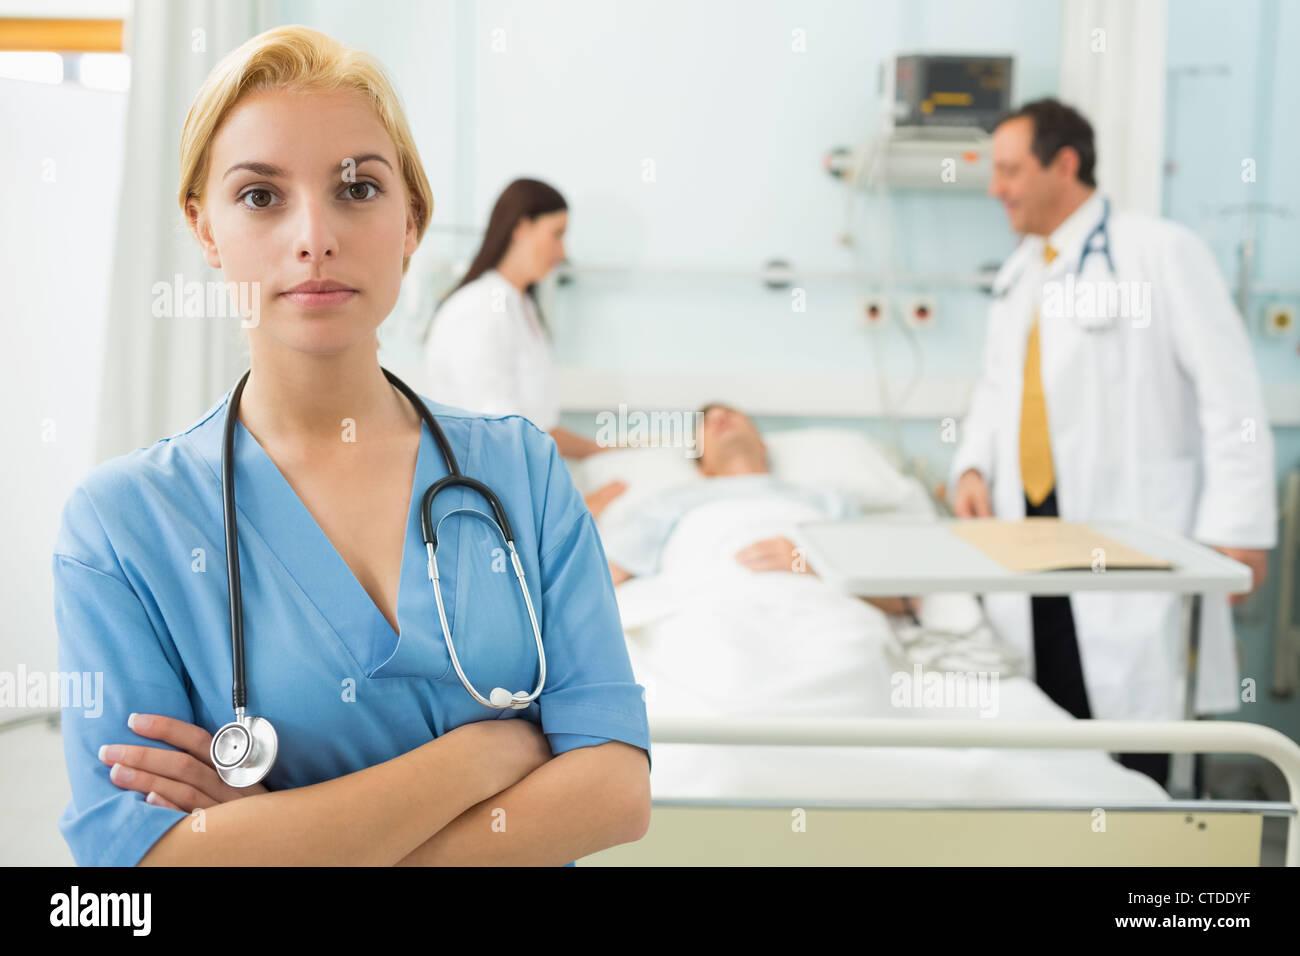 blonde nurse next to medical bed stock photo 49468819 alamy